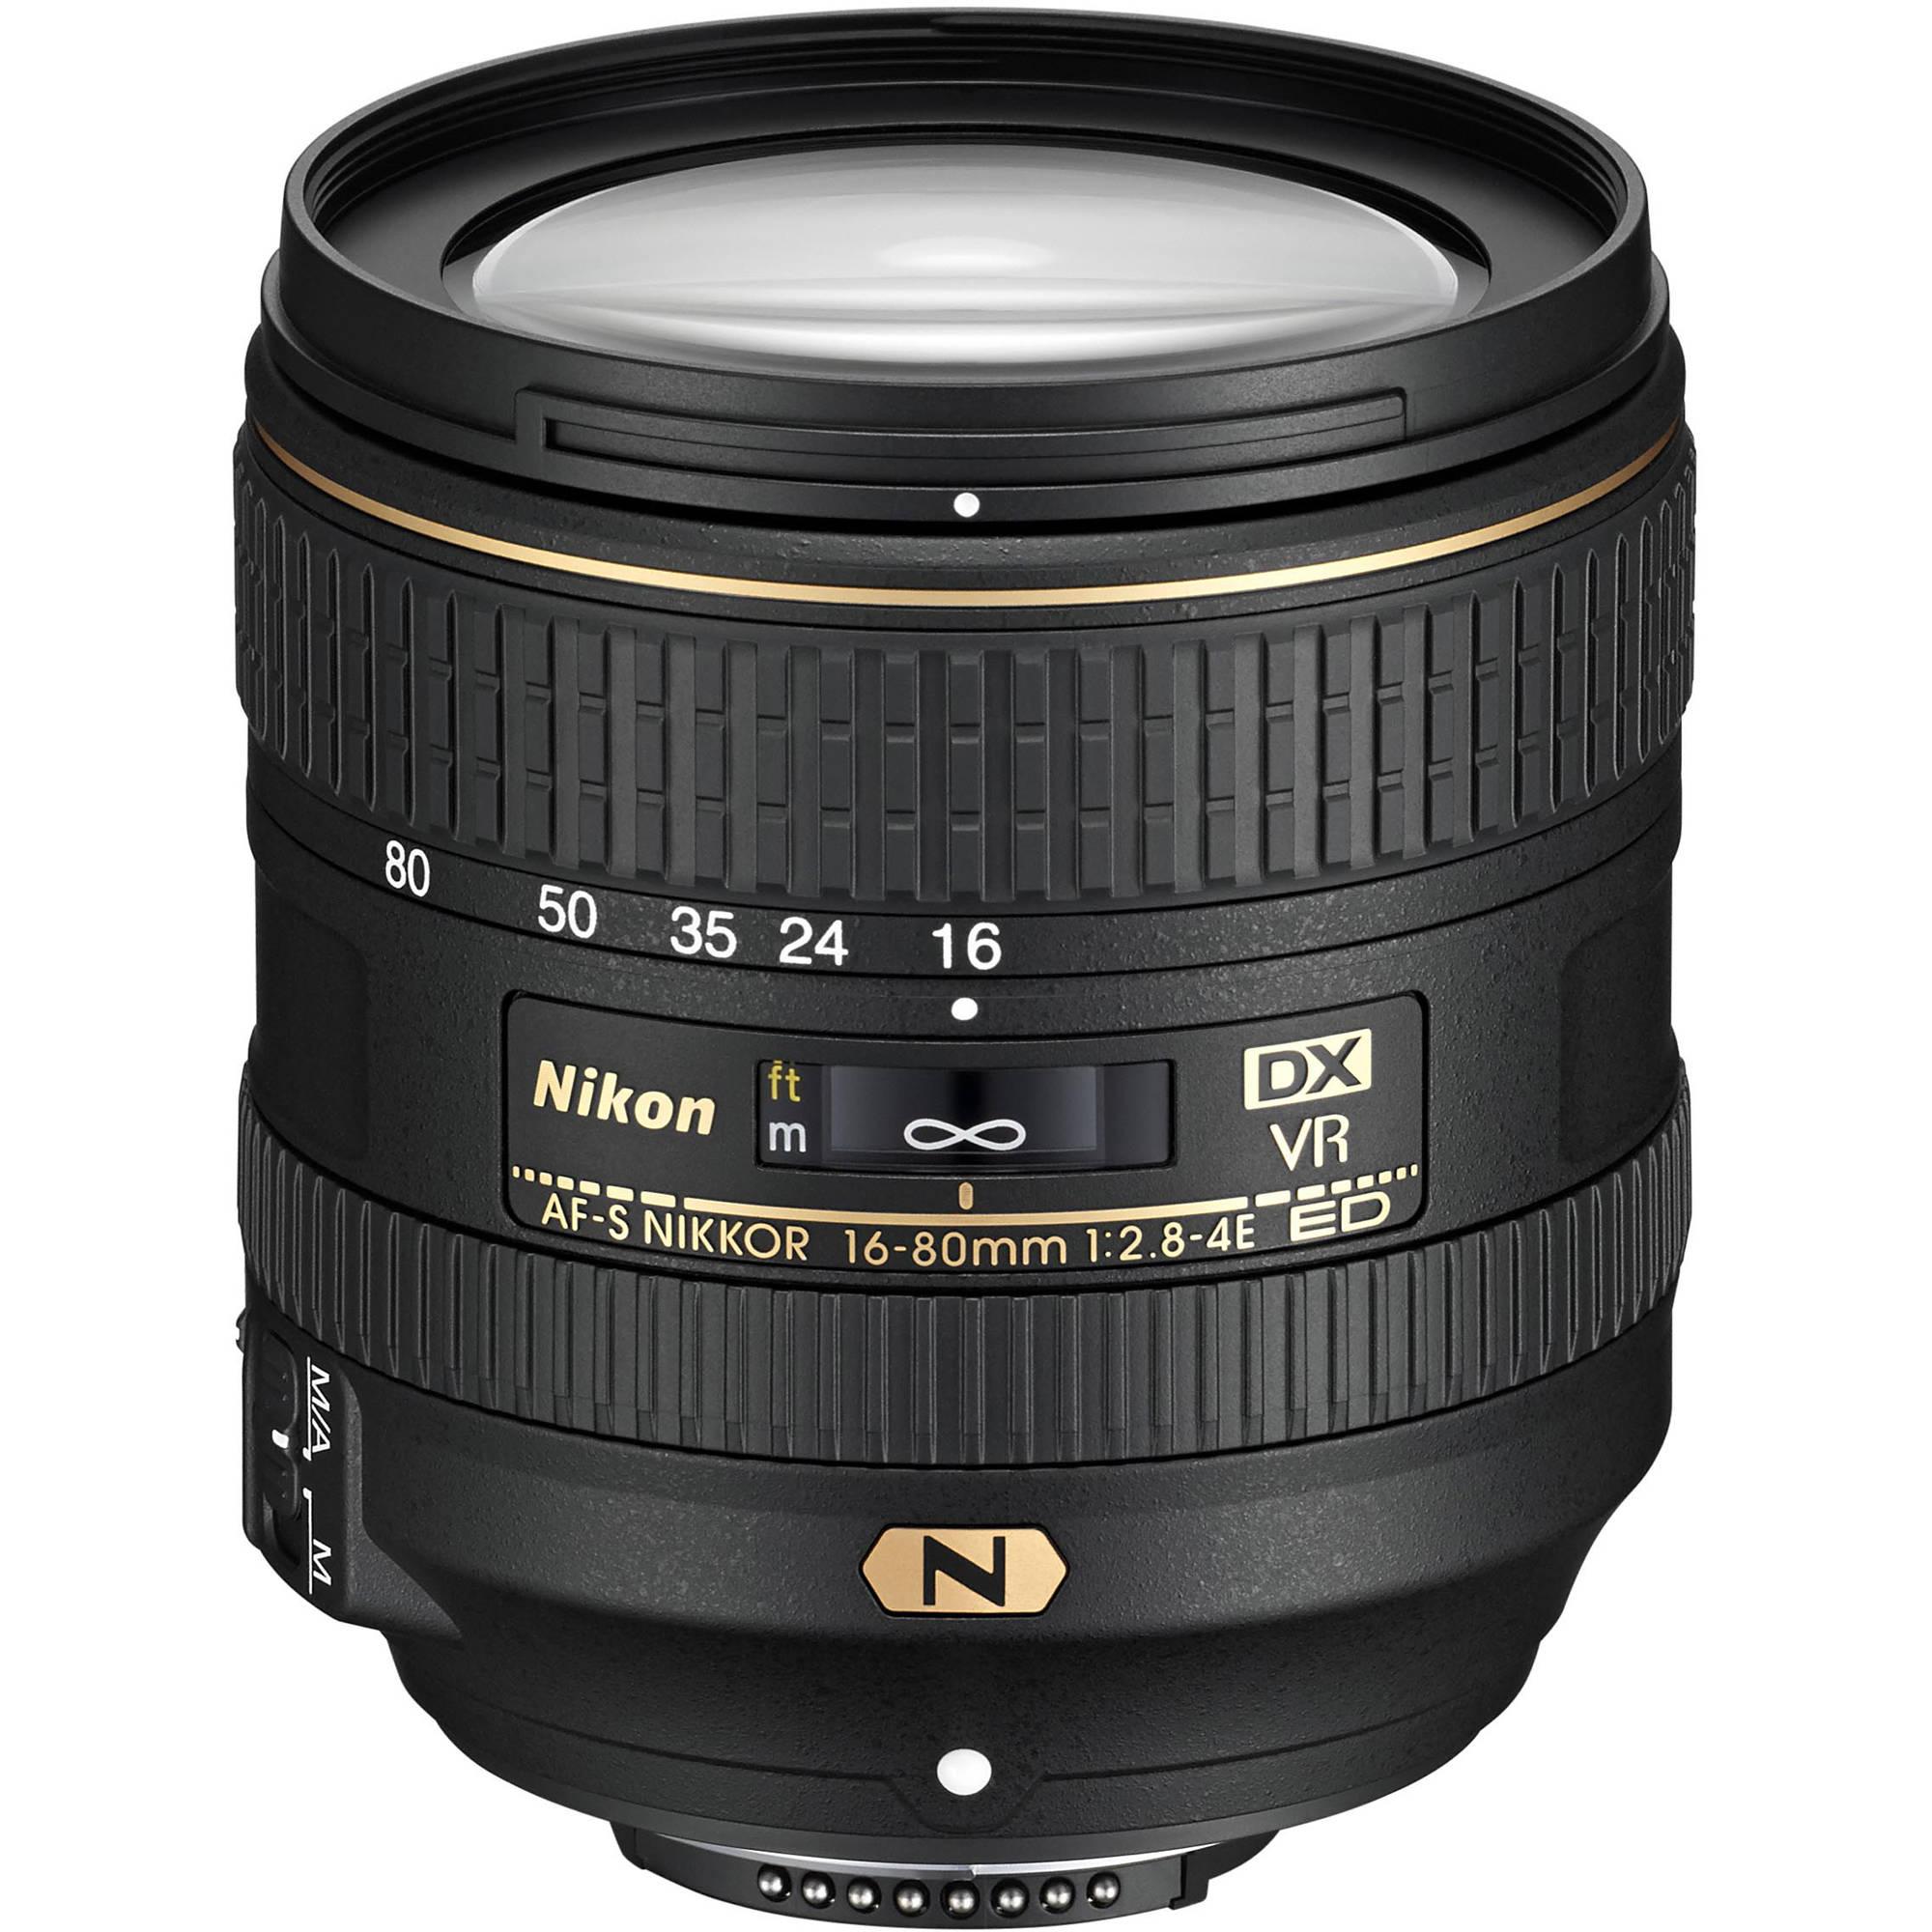 Fetching Nikon Dx Nikkor Ed Vr Nikon Dx Nikkor Ed Vr Lens Nikon D3300 Refurbished Body Nikon D3300 Refurbished Ebay dpreview Nikon D3300 Refurbished